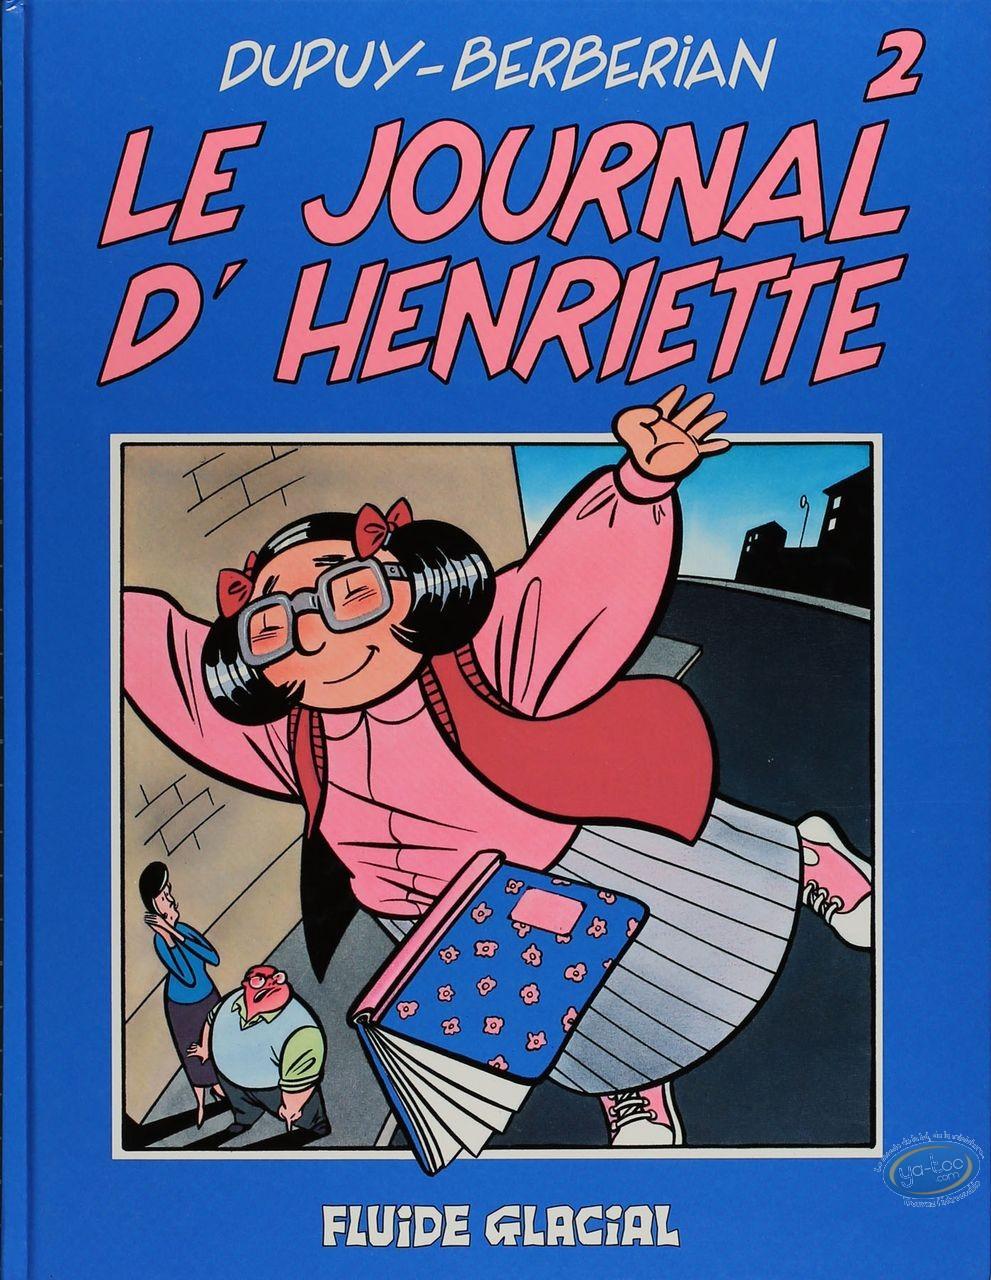 Listed European Comic Books, Journal d'Henriette (Le) : Le Journal d'Henriette